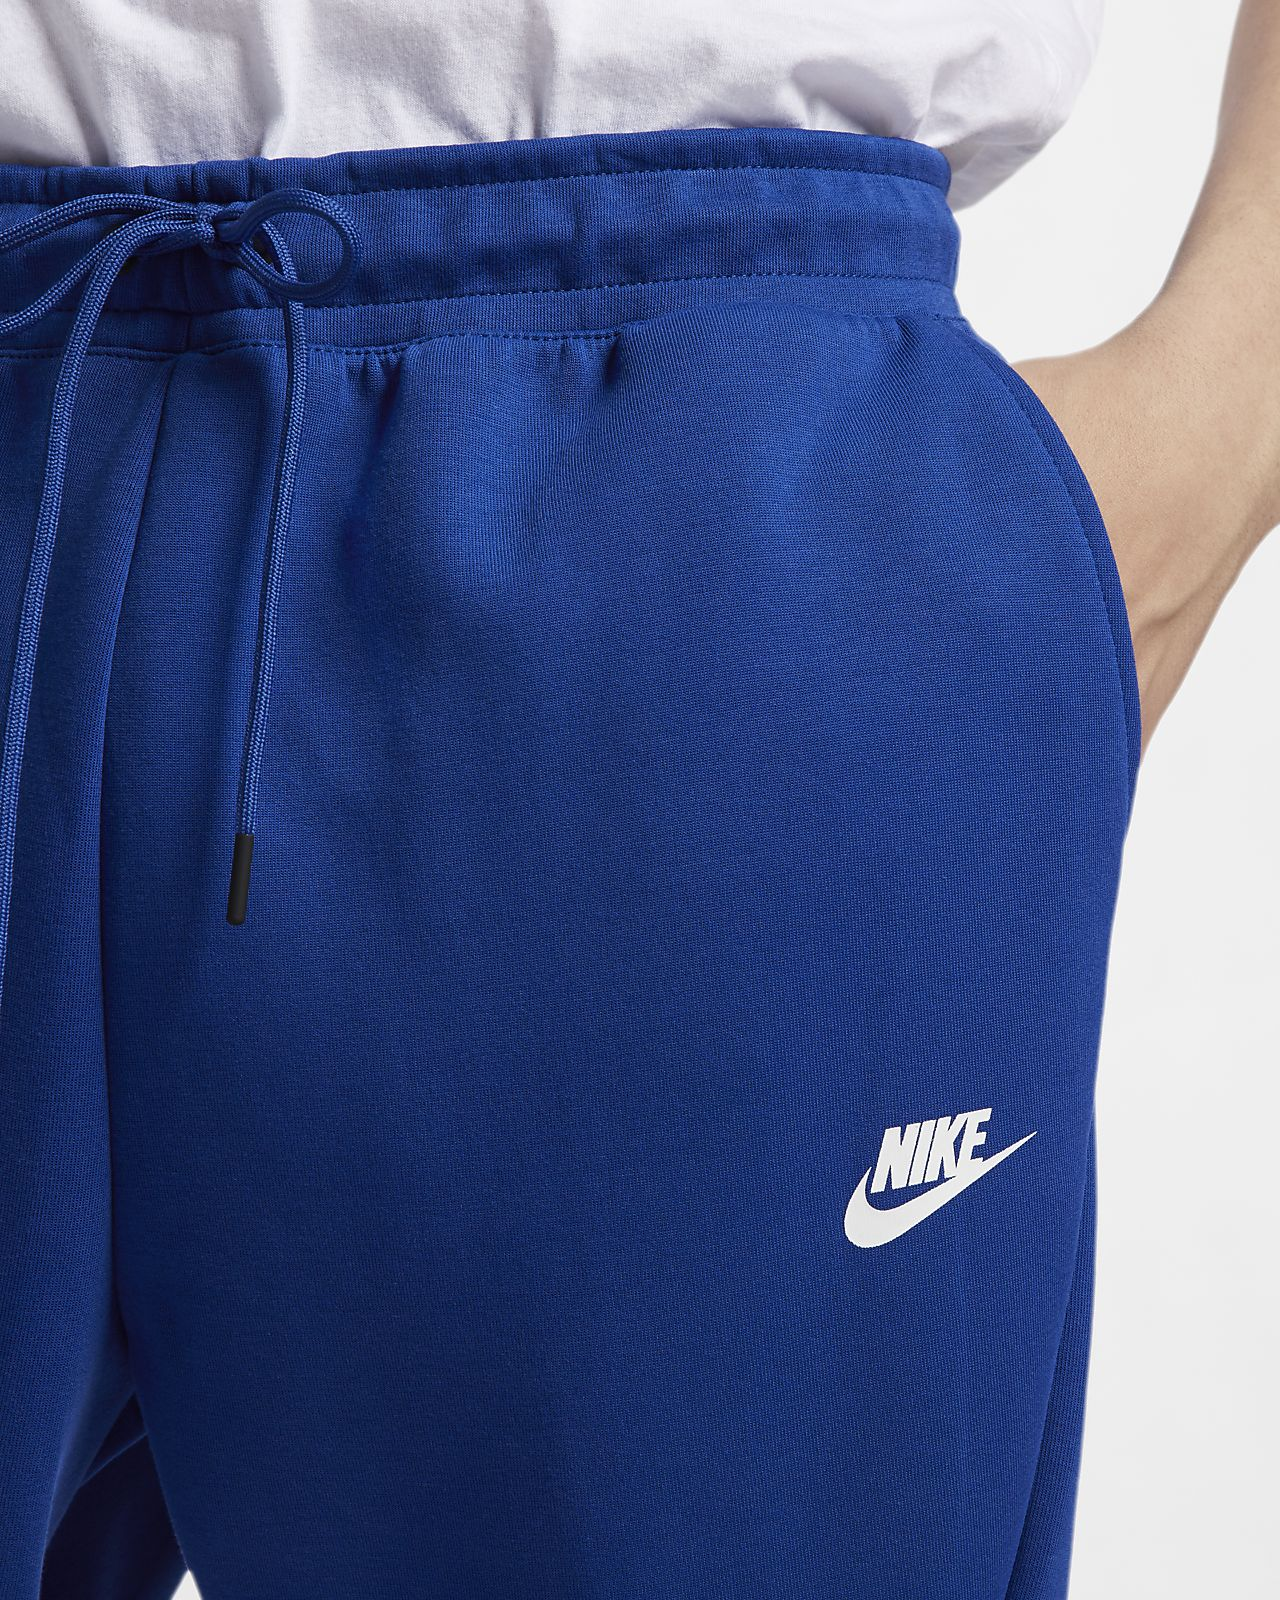 a60bab0a6dc Nike Sportswear Tech Fleece Men's Joggers. Nike.com GB